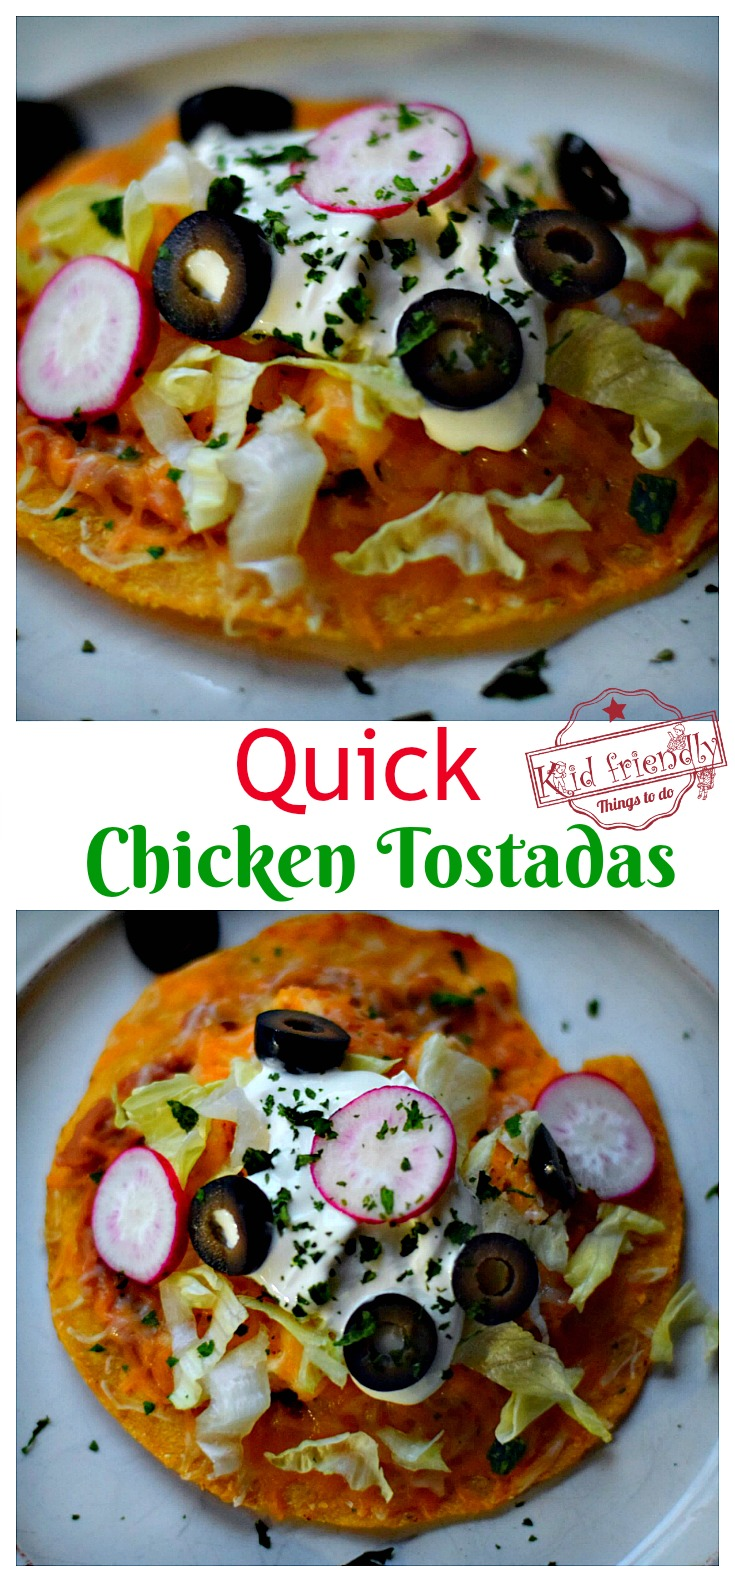 Quick Chicken Tostadas - An Easy Mexican Food Recipe